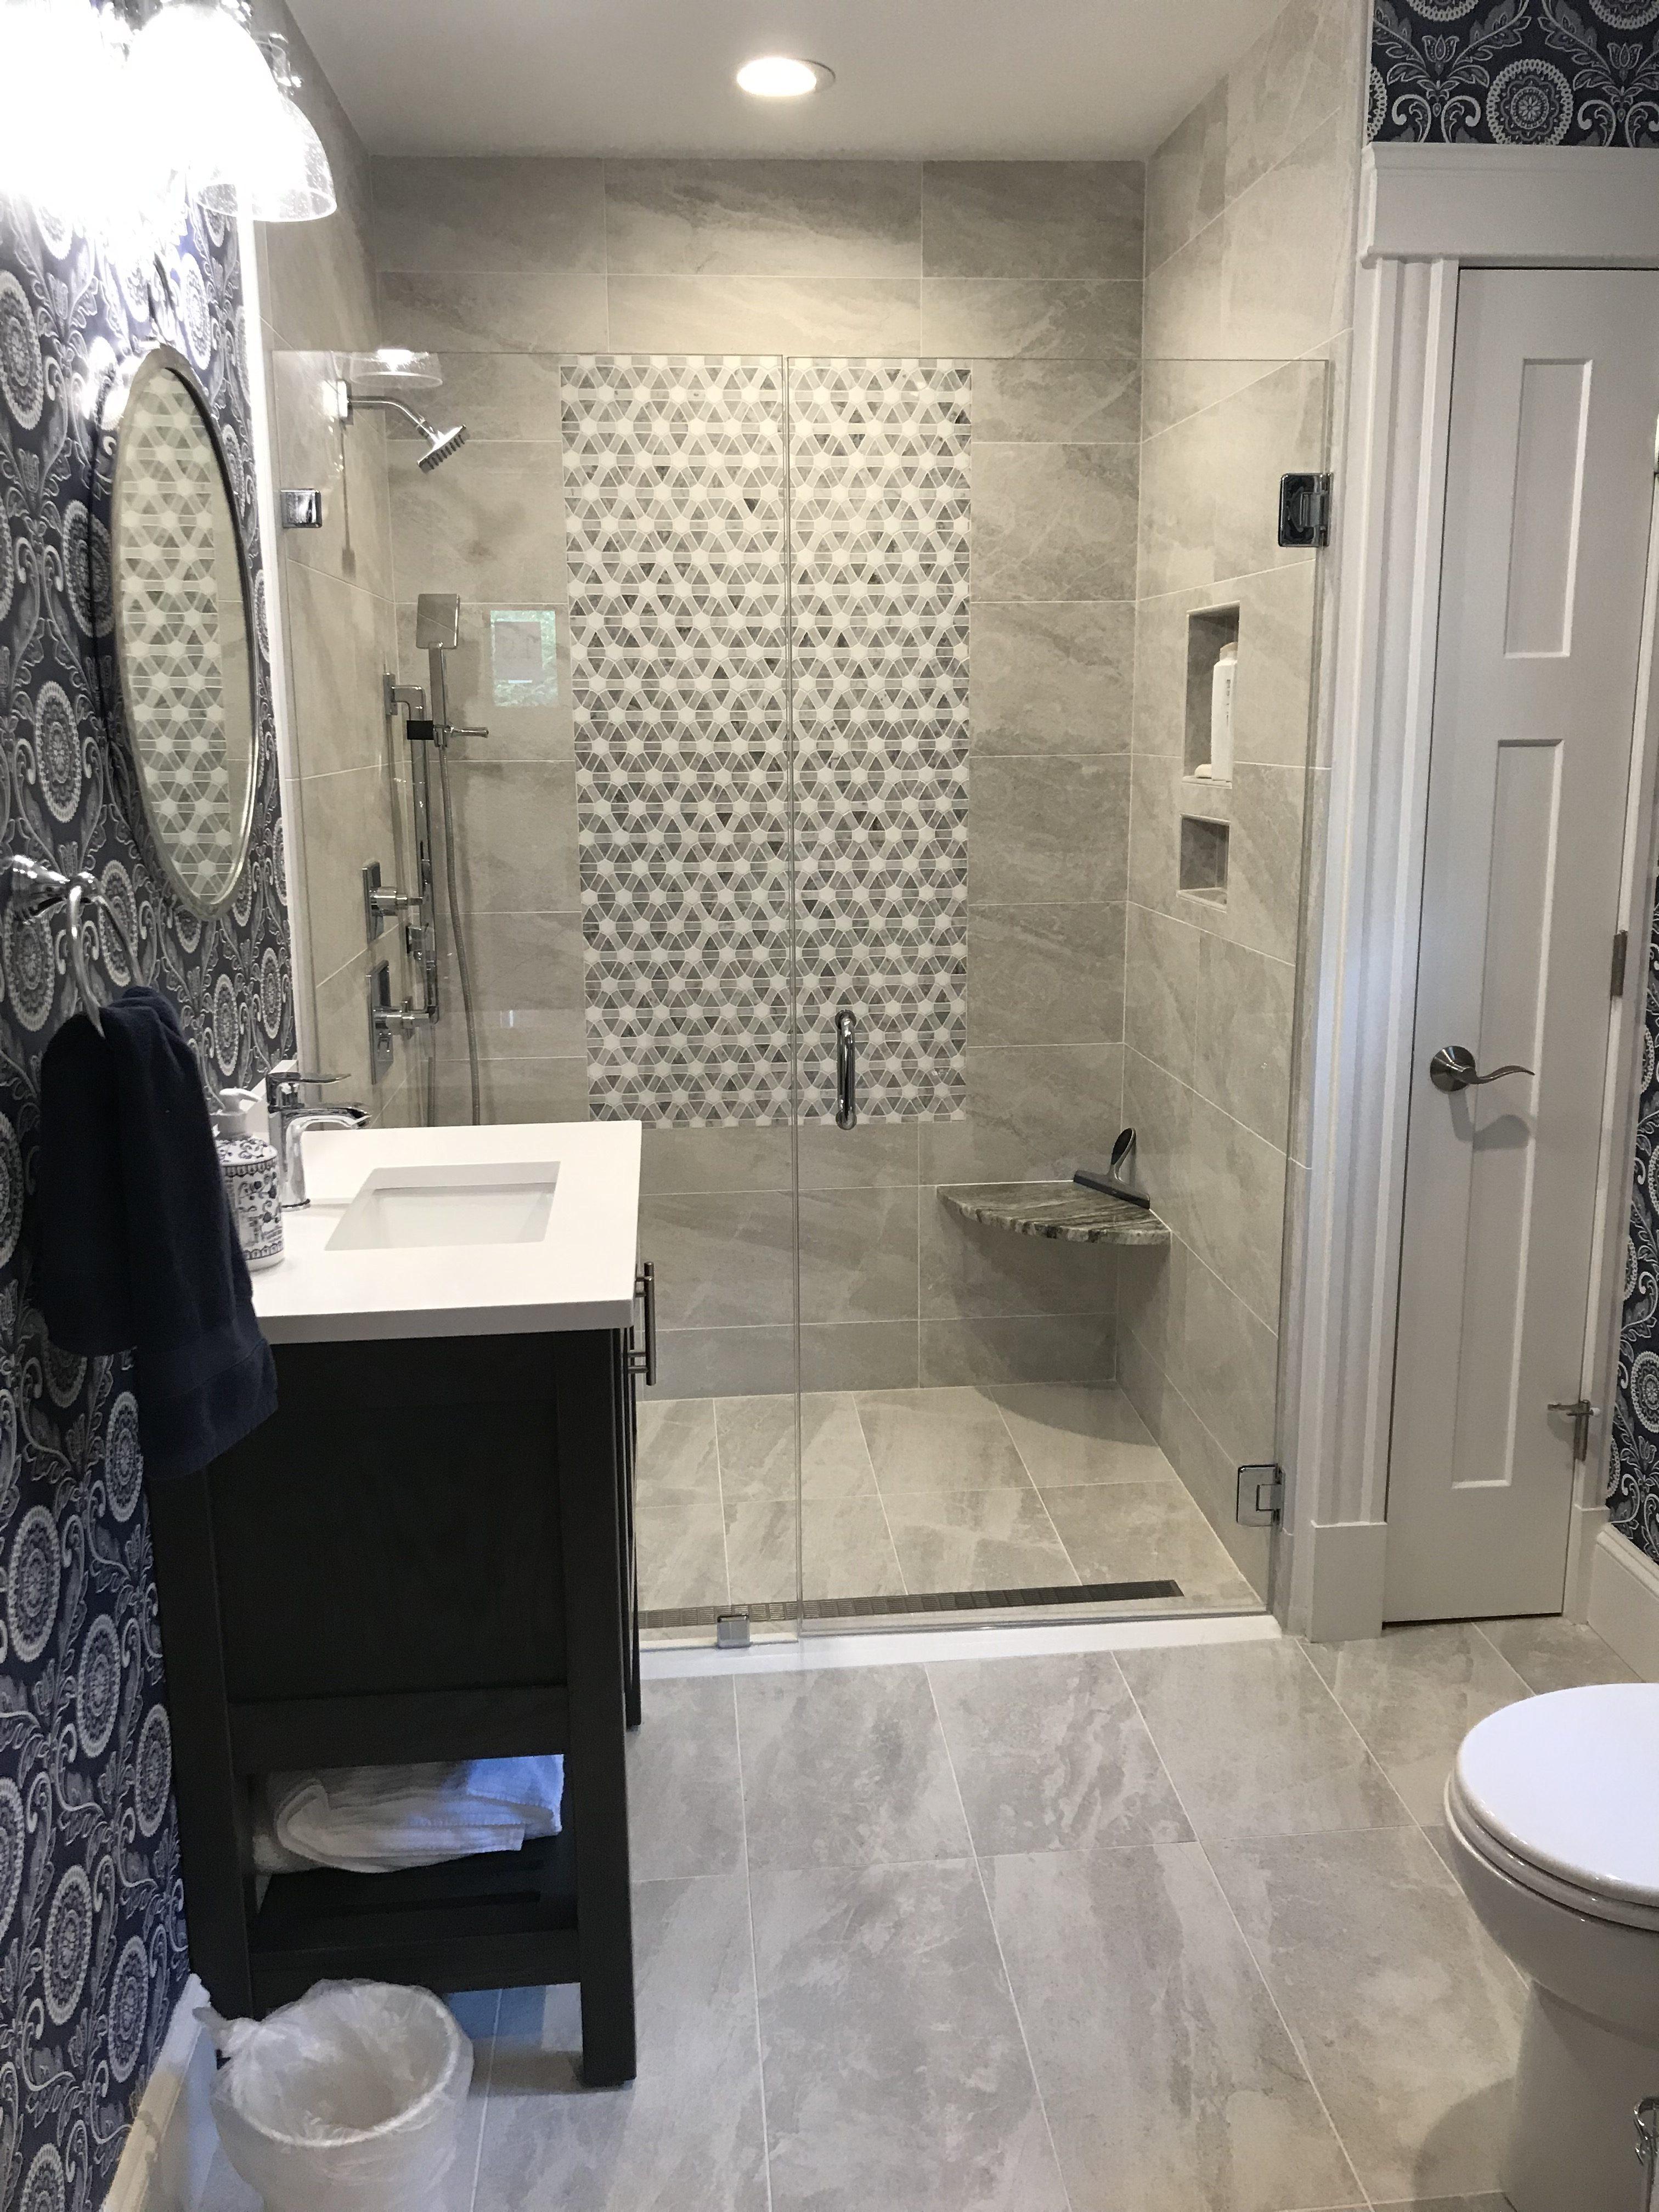 Bathroom Tile Inspiration Best Tiles For Bathrooms Tiles Plus More